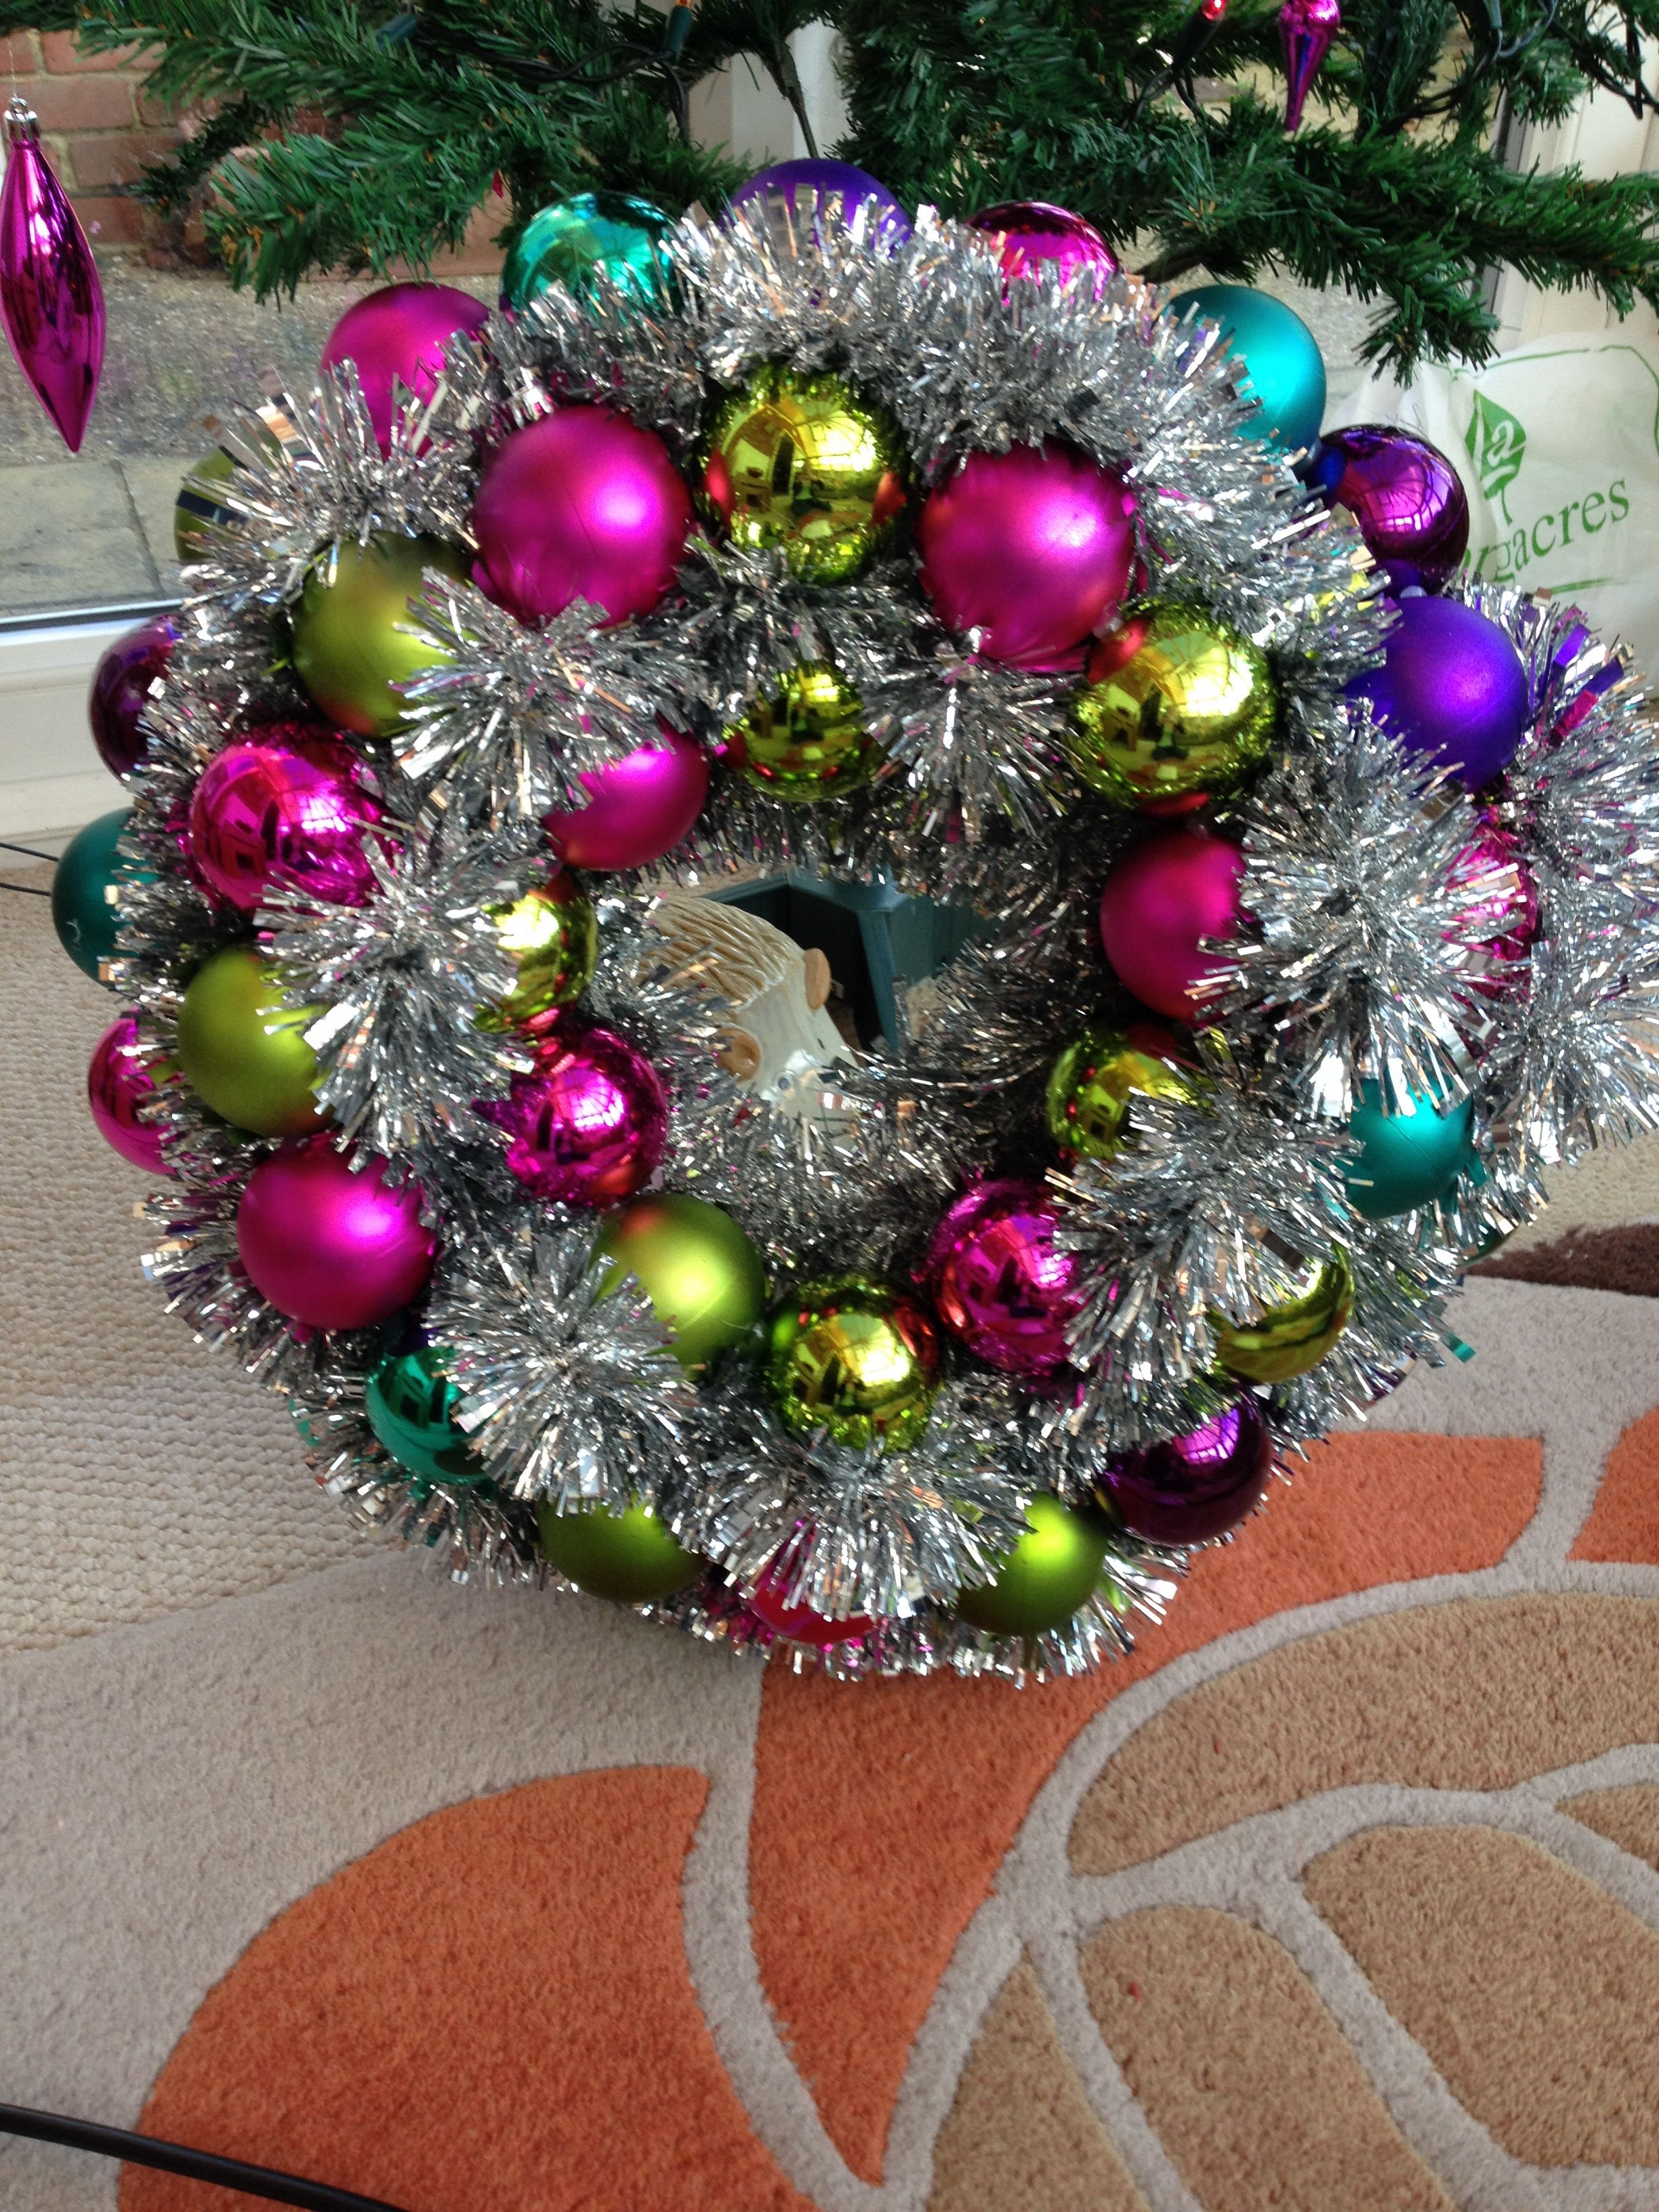 Made A Christmas Wreath Used Polystyrene Hobycraft Bulbuls Argos Tinsel Longacres